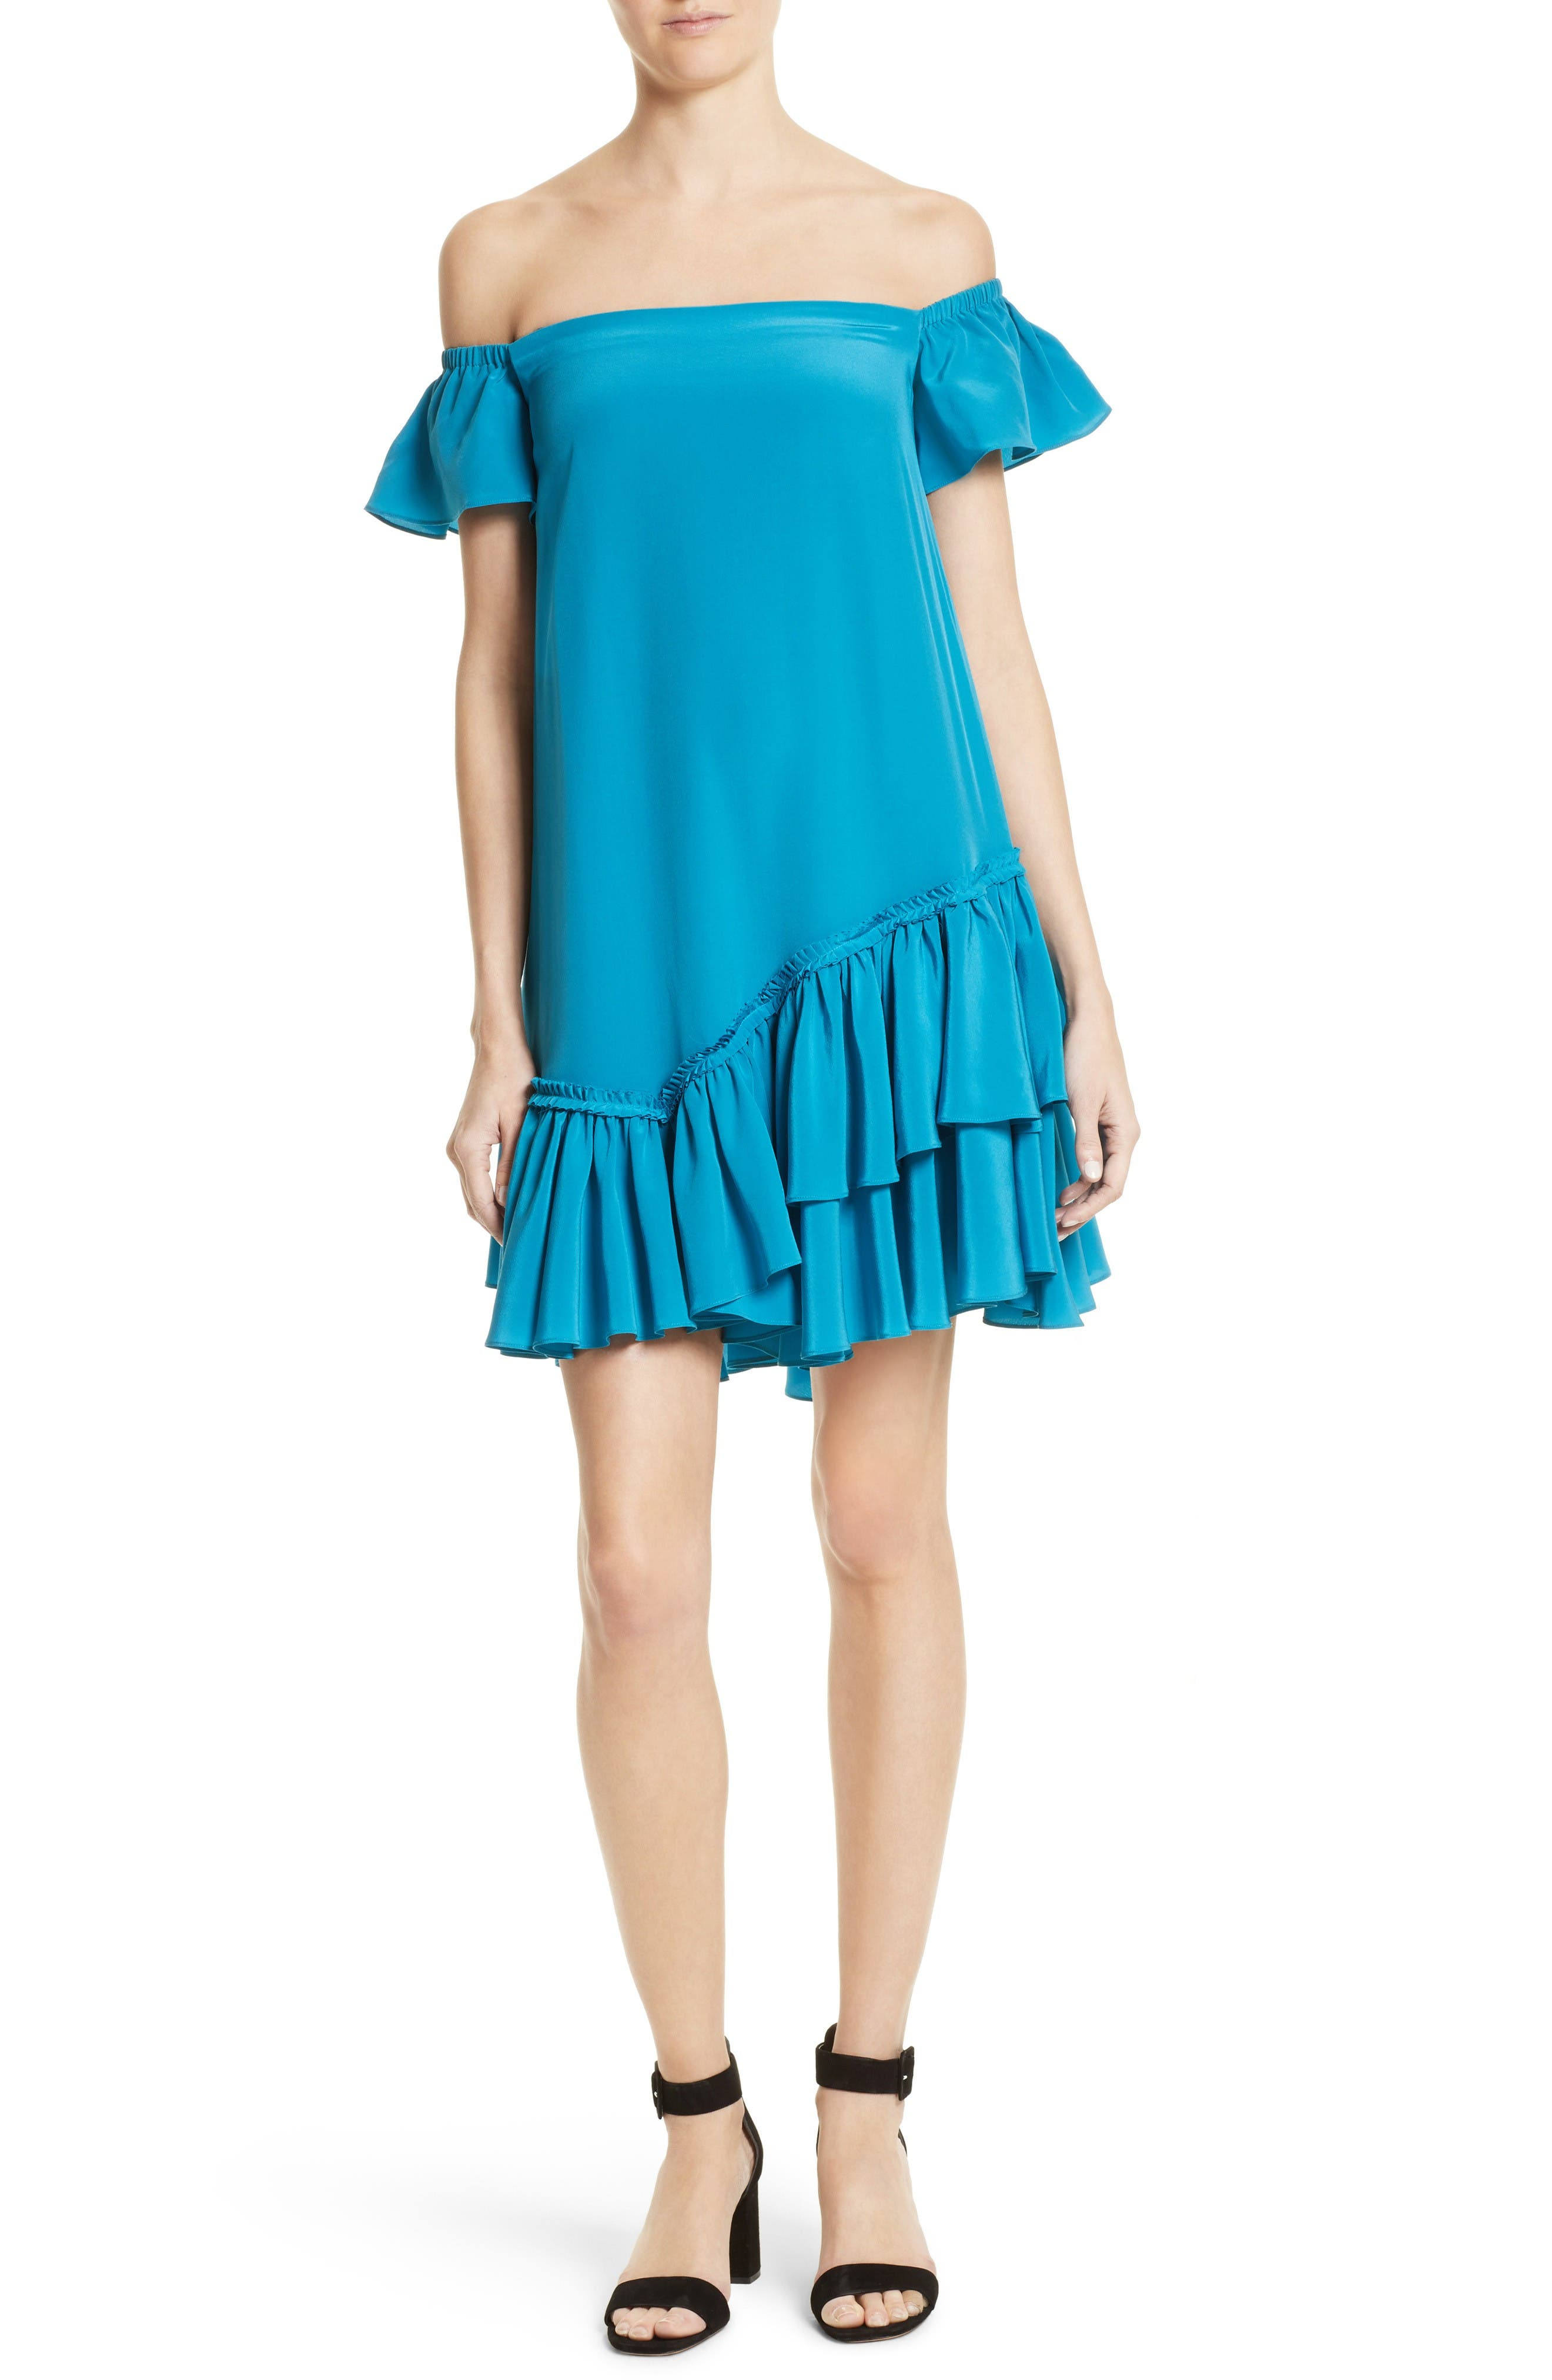 CINQ À SEPT Minella Ruffle Off the Shoulder Dress